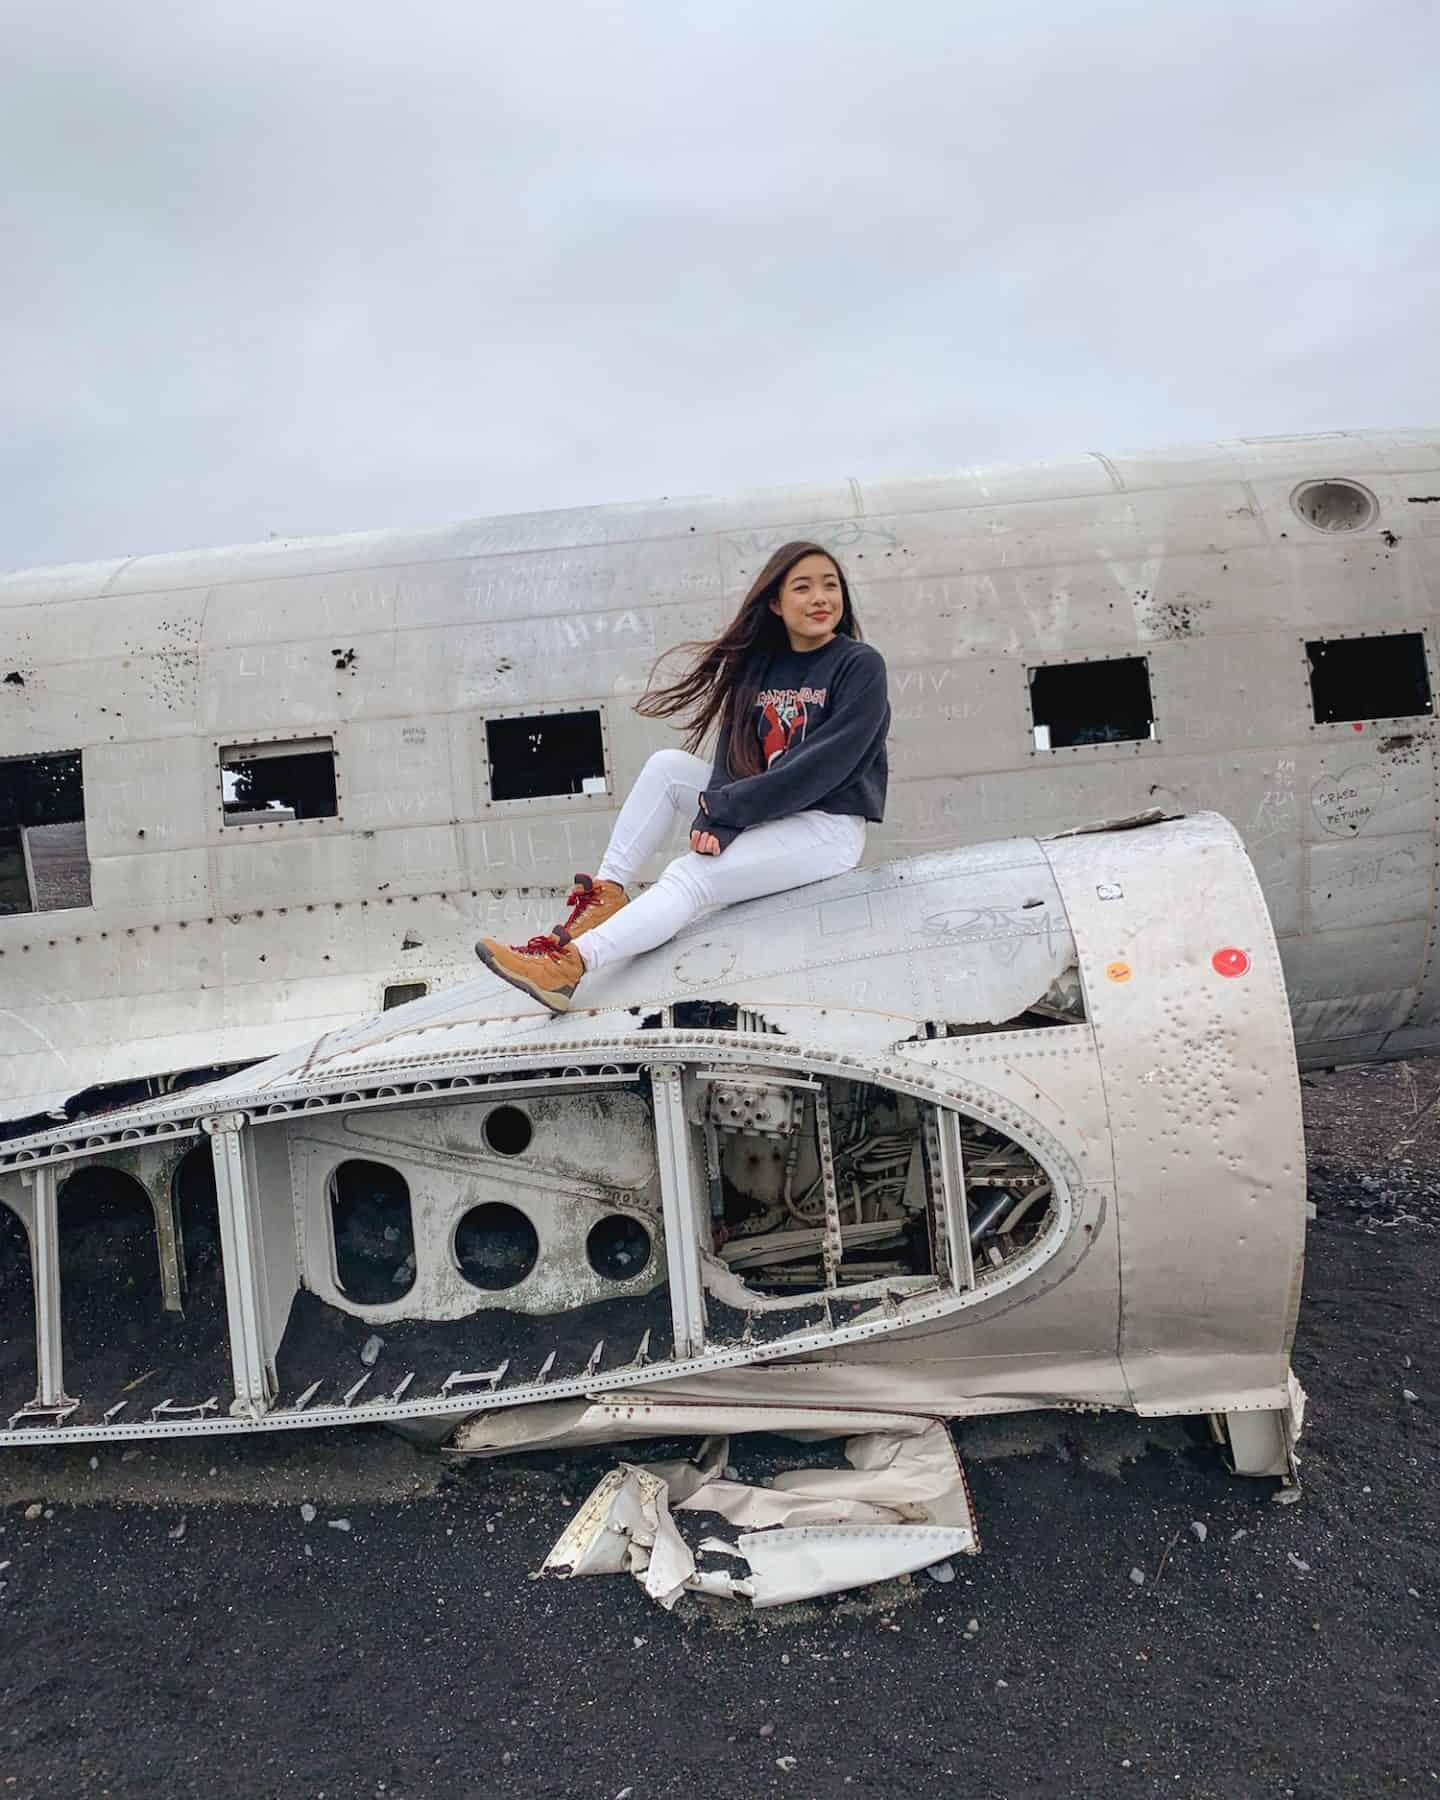 Sólheimasandur Plane Wreckage along the Iceland Ring Road